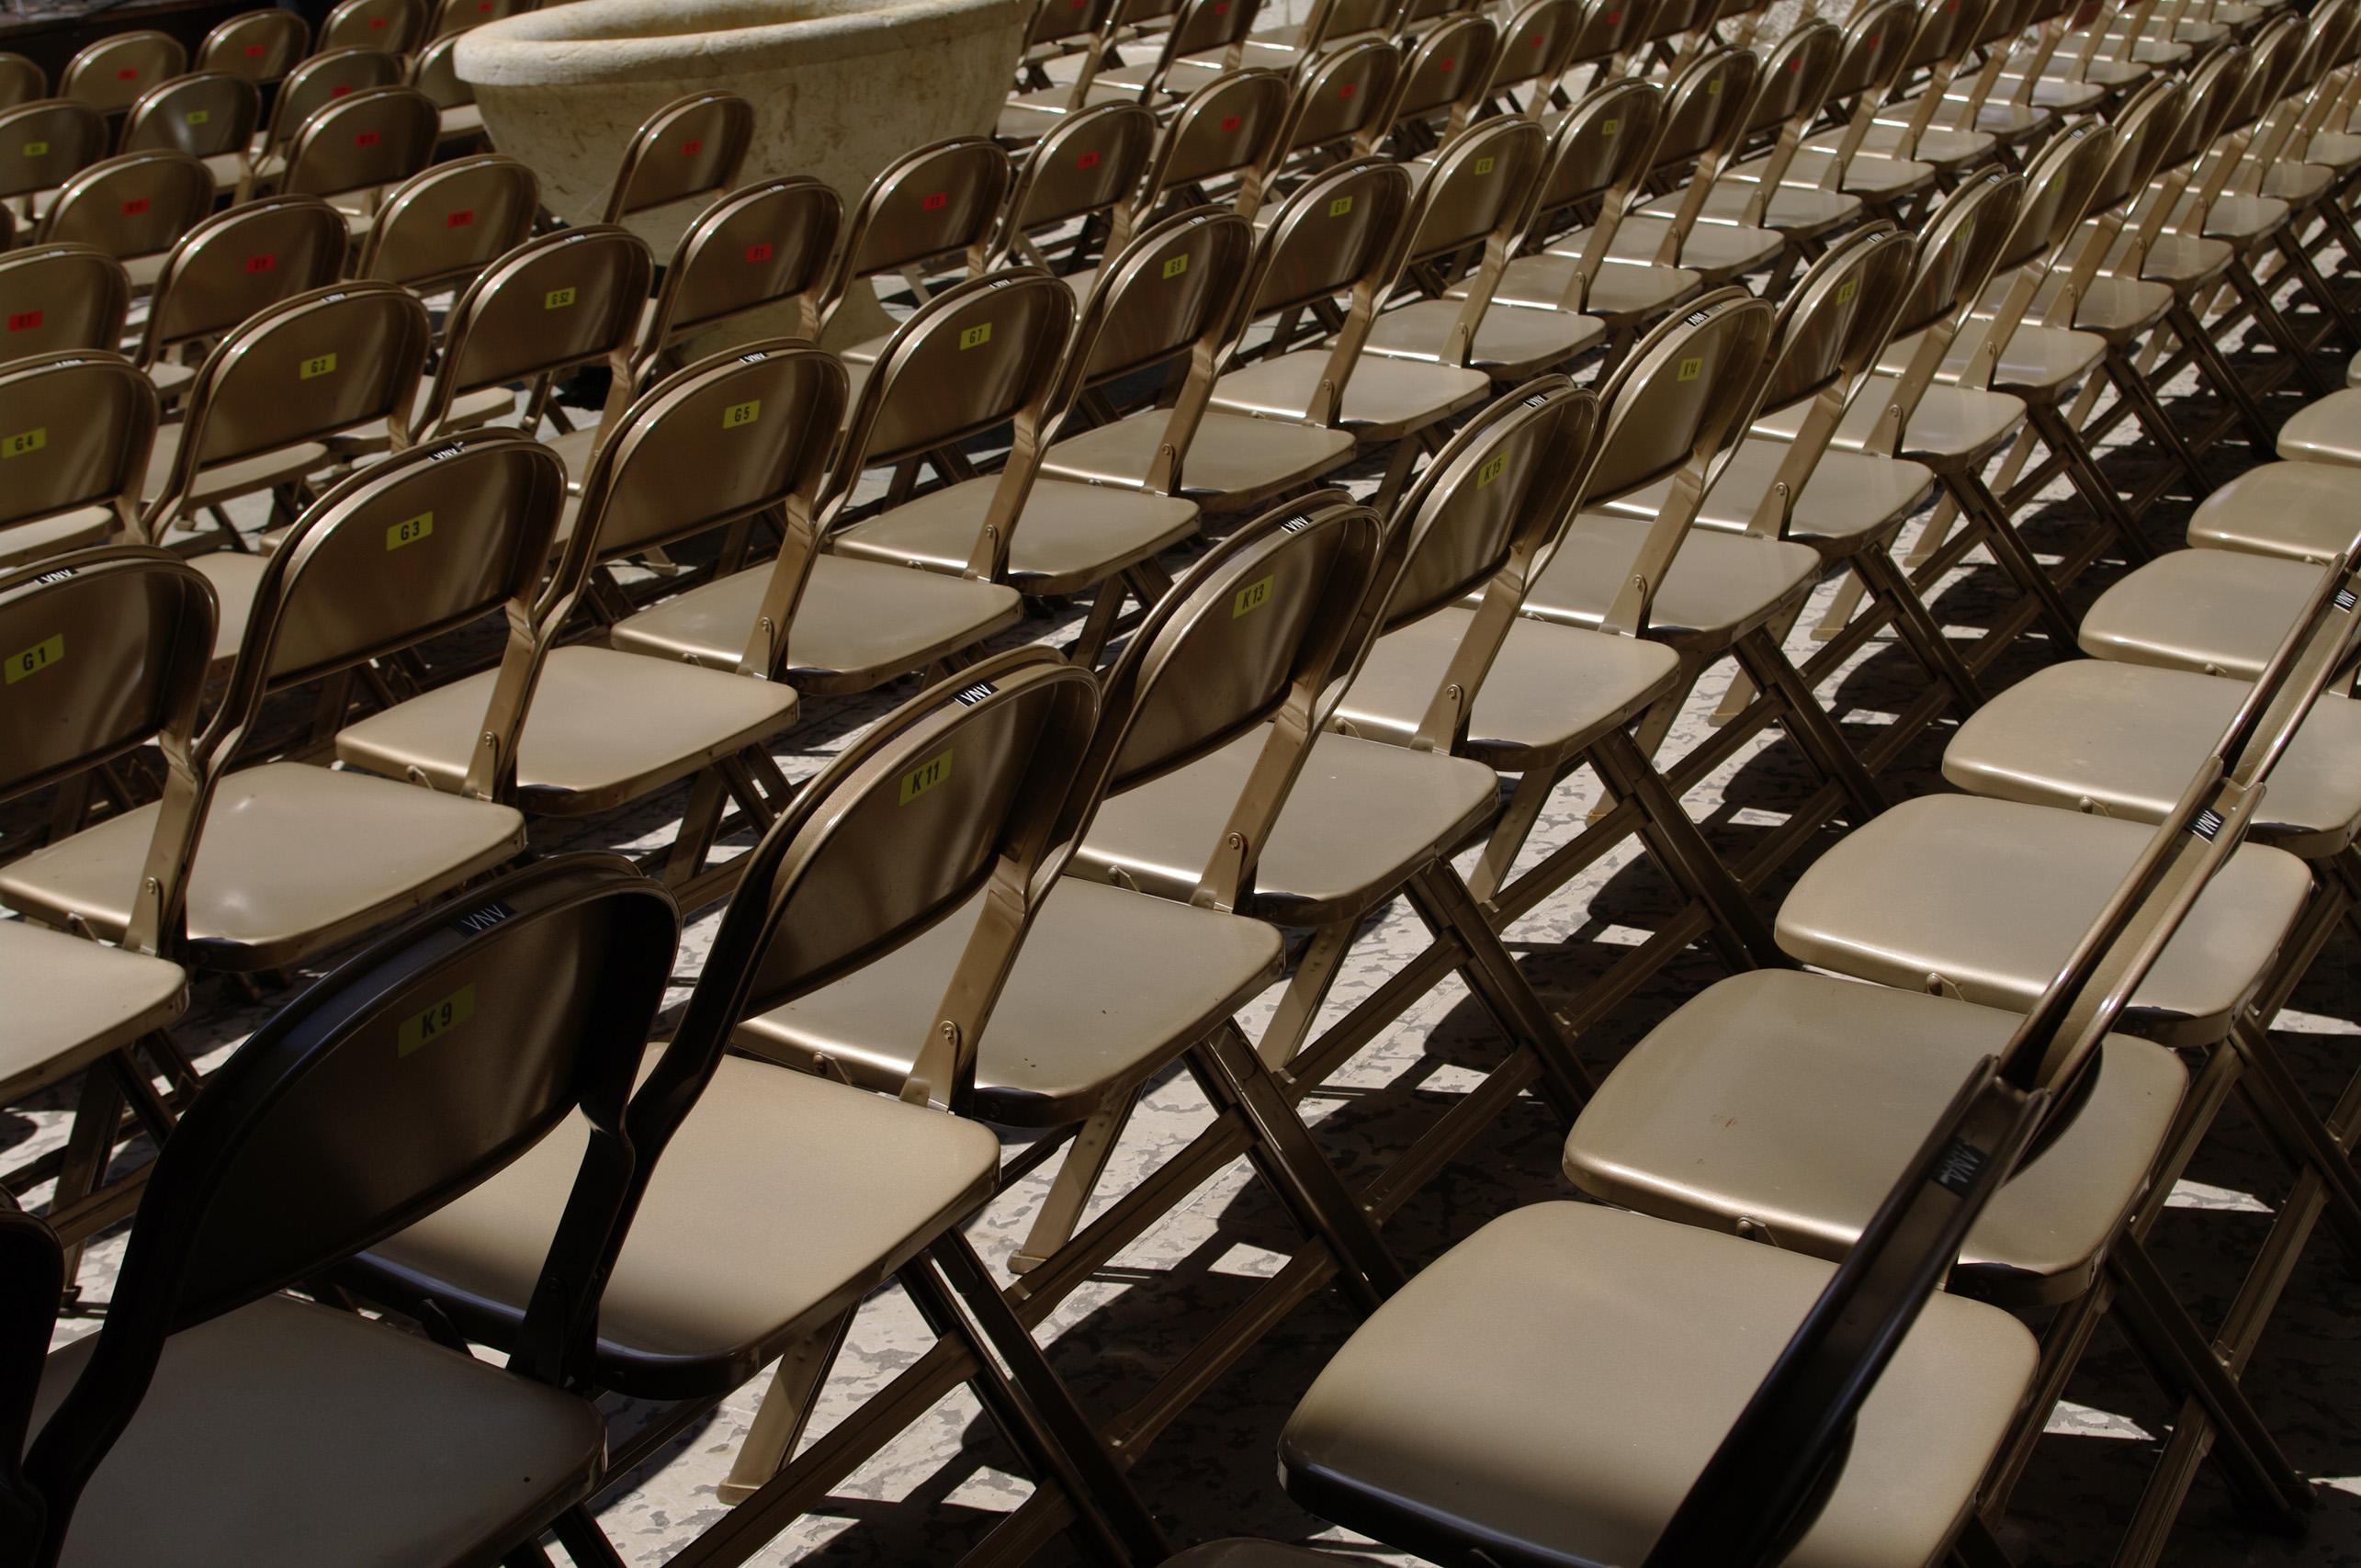 Range of chairs photo